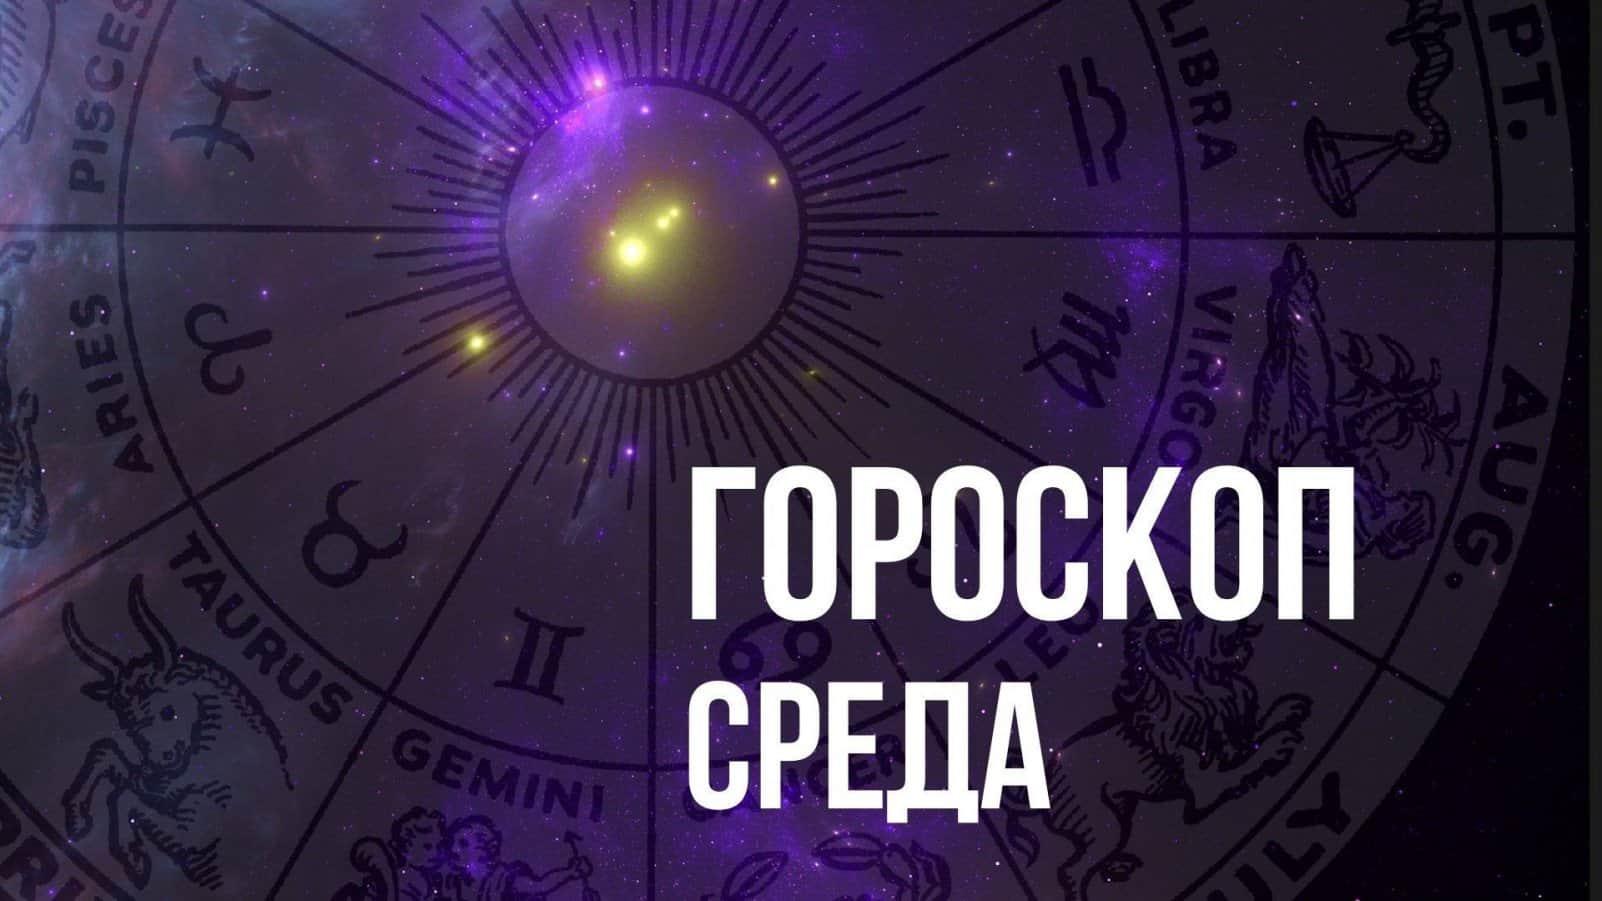 Гороскоп на среду 4 августа для каждого знака Зодиака